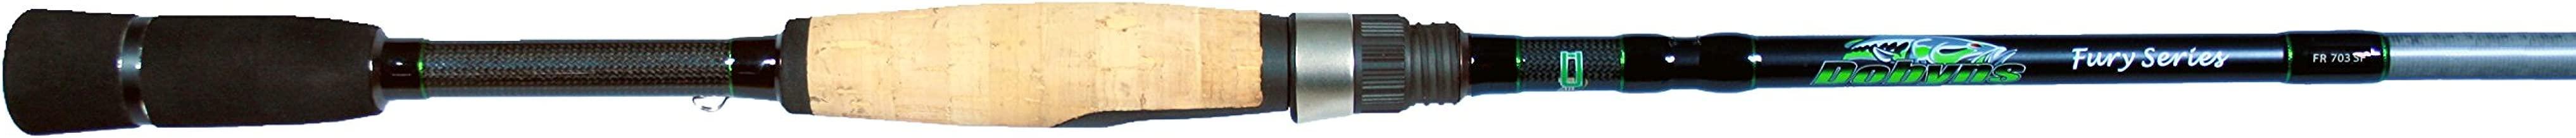 Dobyns Rods Fury Series FR 702SF Medium/Light Power Fast Action Spinning Rod, 7'0